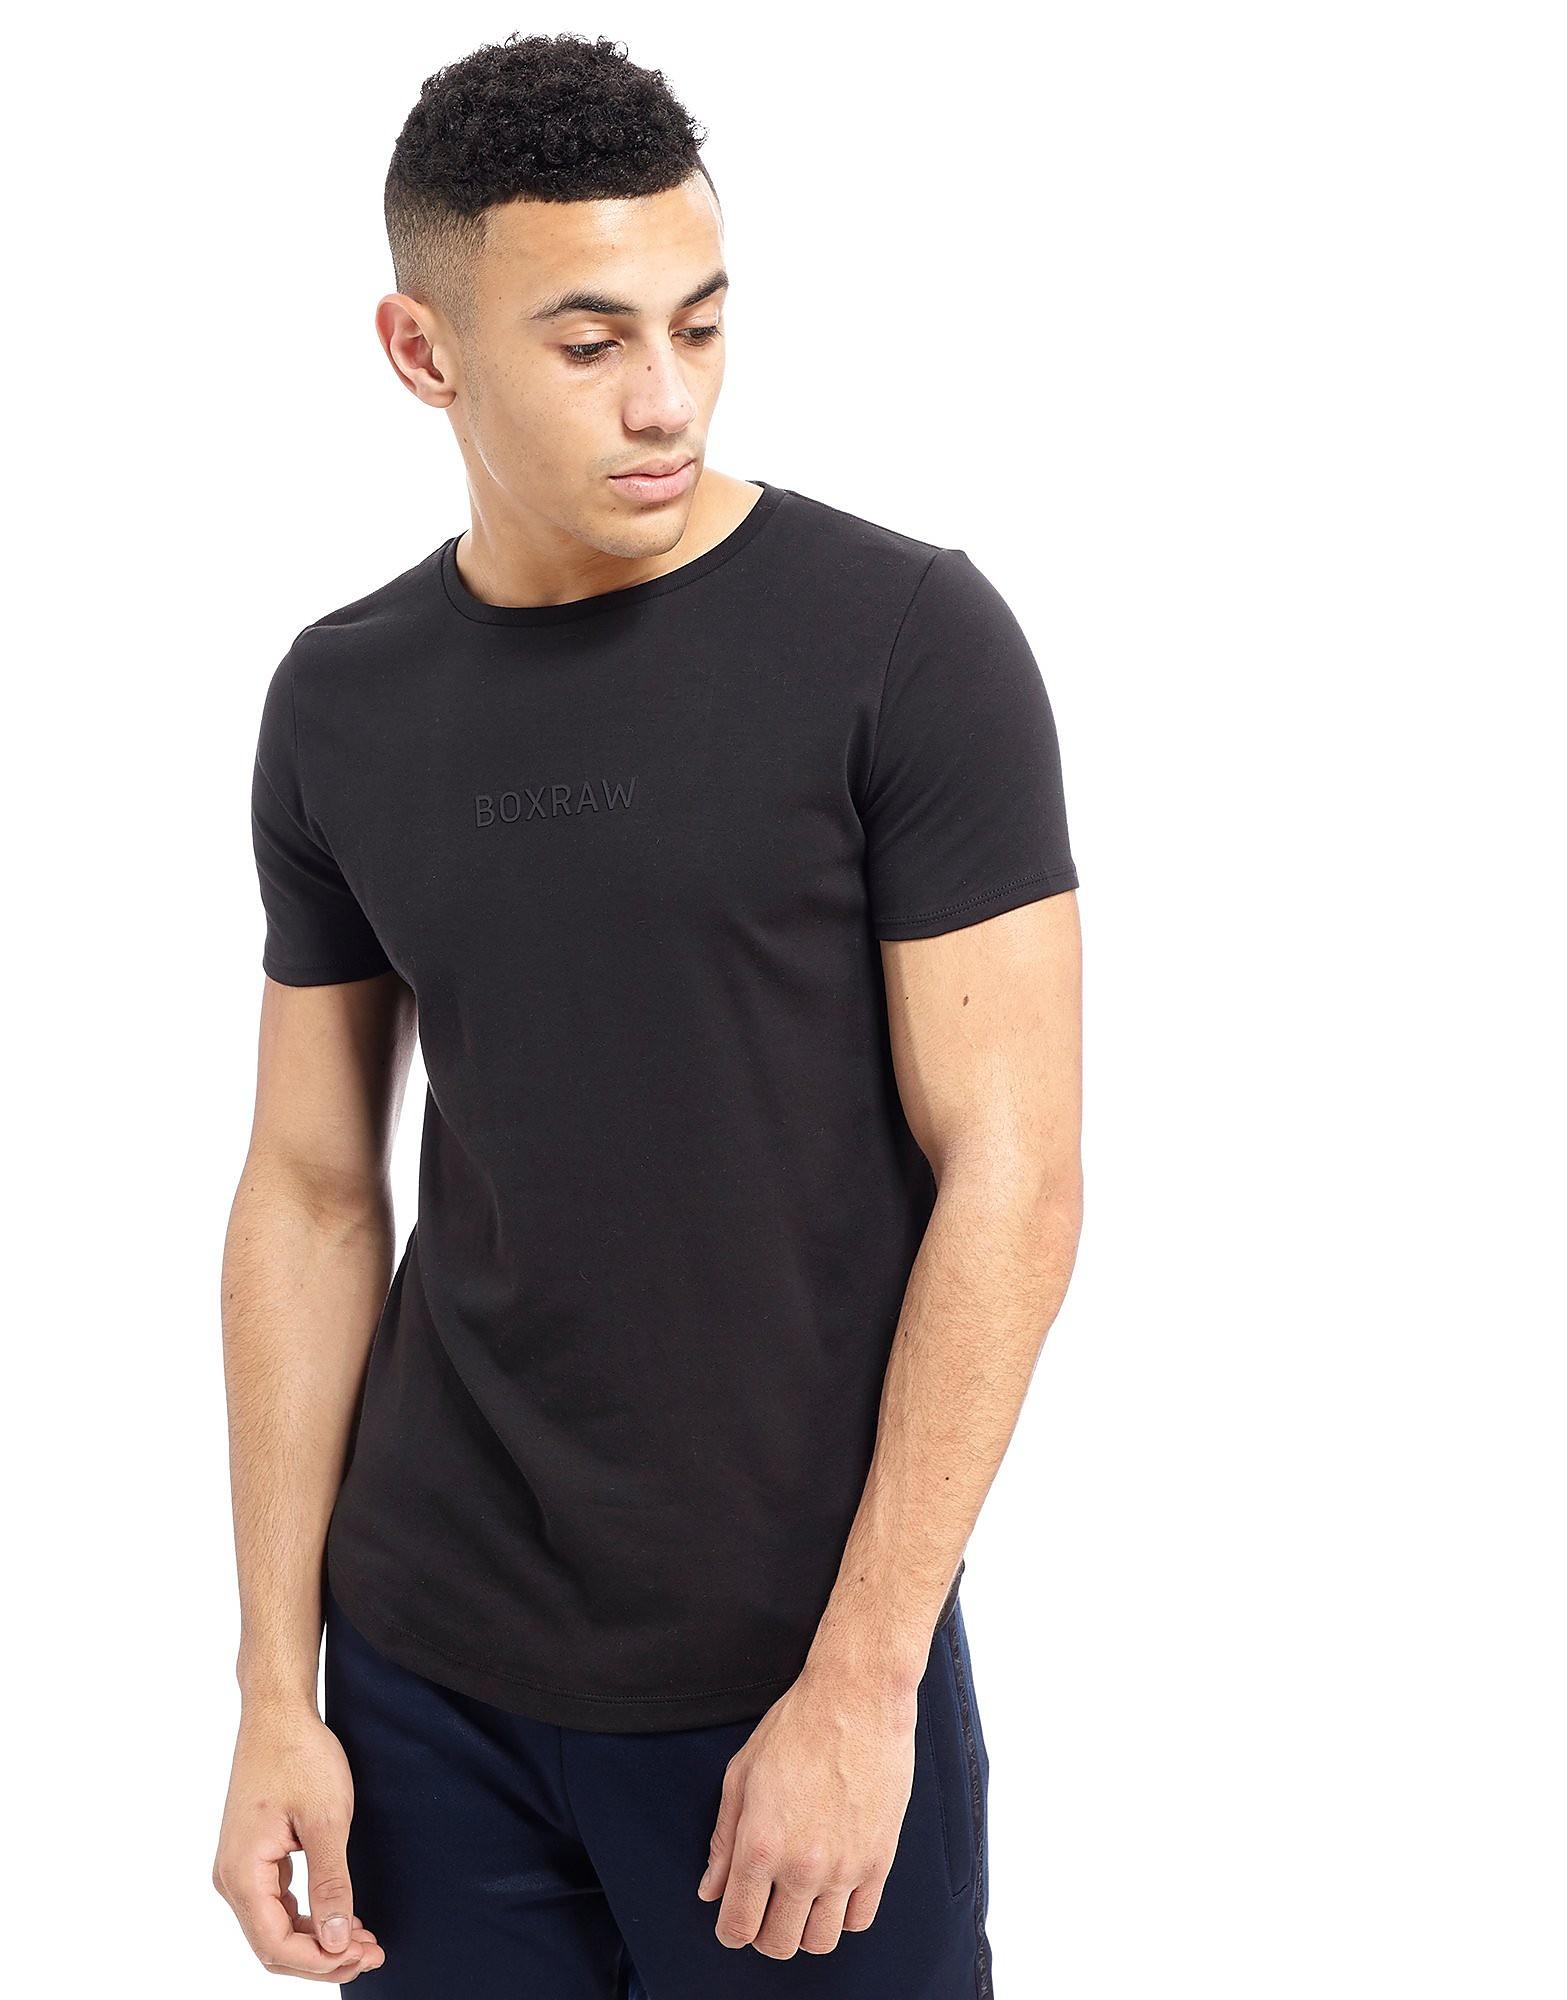 BOXRAW Pima Cotton T-Shirt